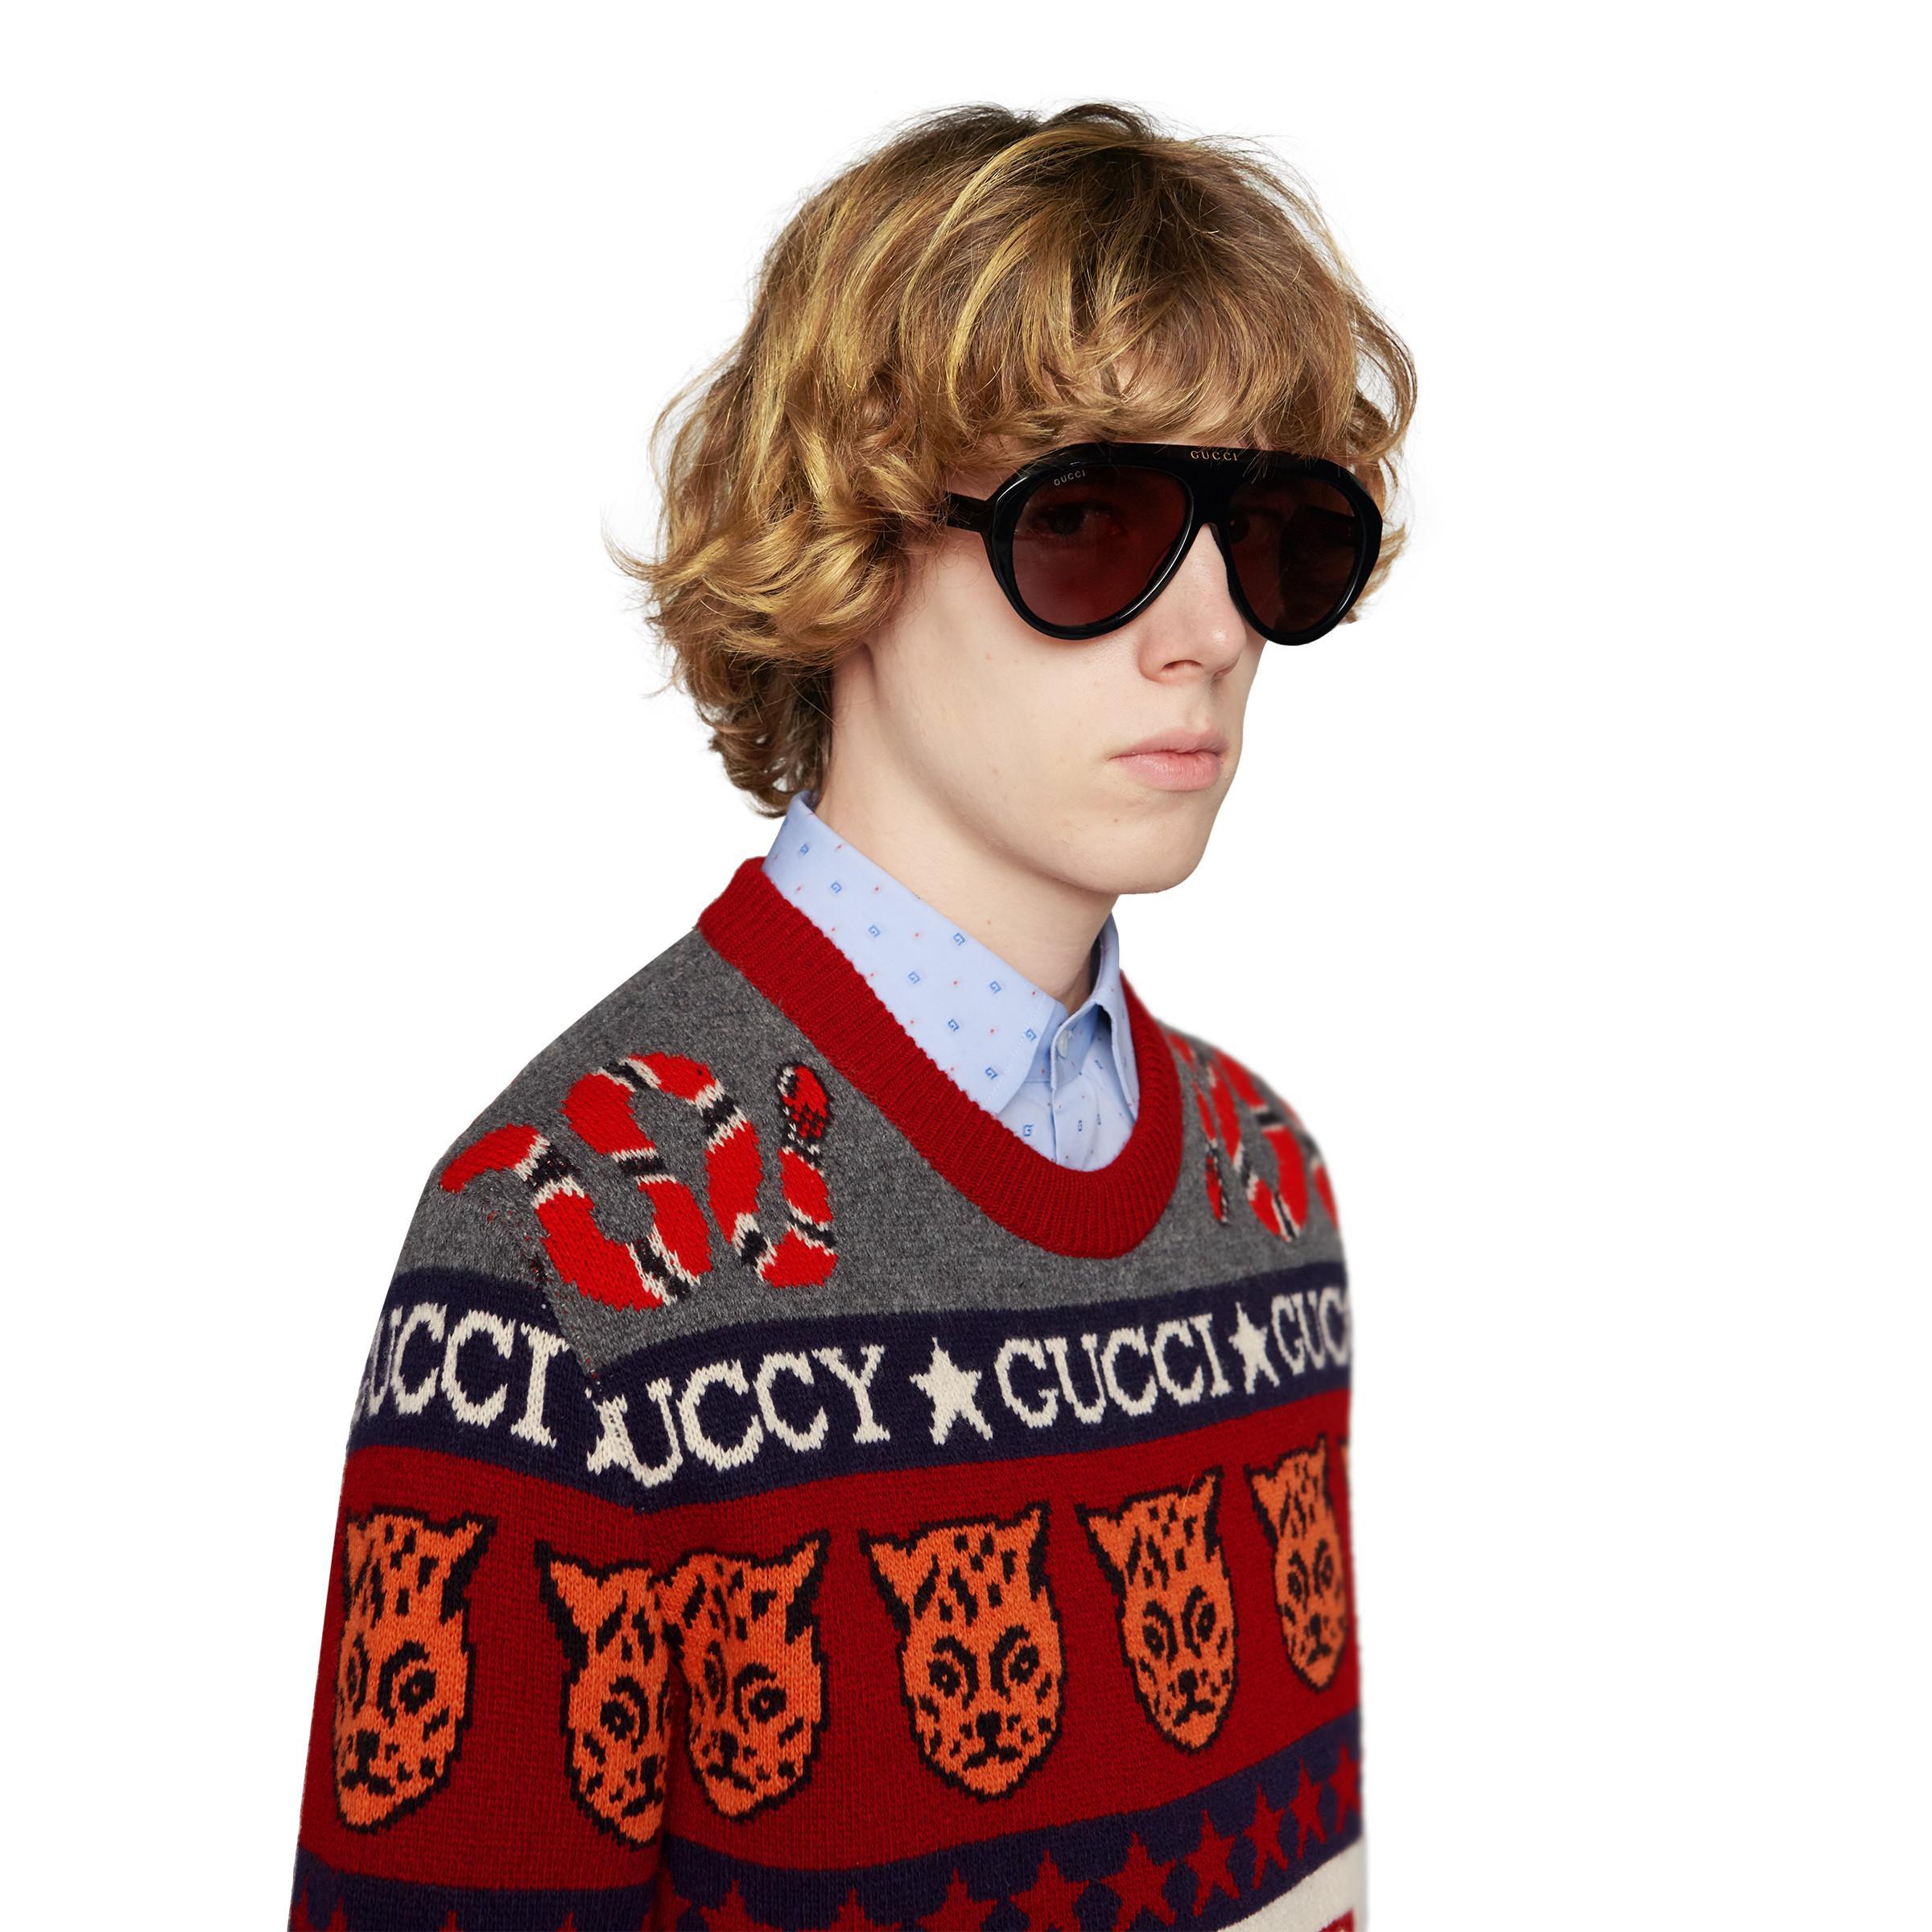 04a8e789db6c Gucci - Black Navigator Sunglasses With Double G for Men - Lyst. View  fullscreen